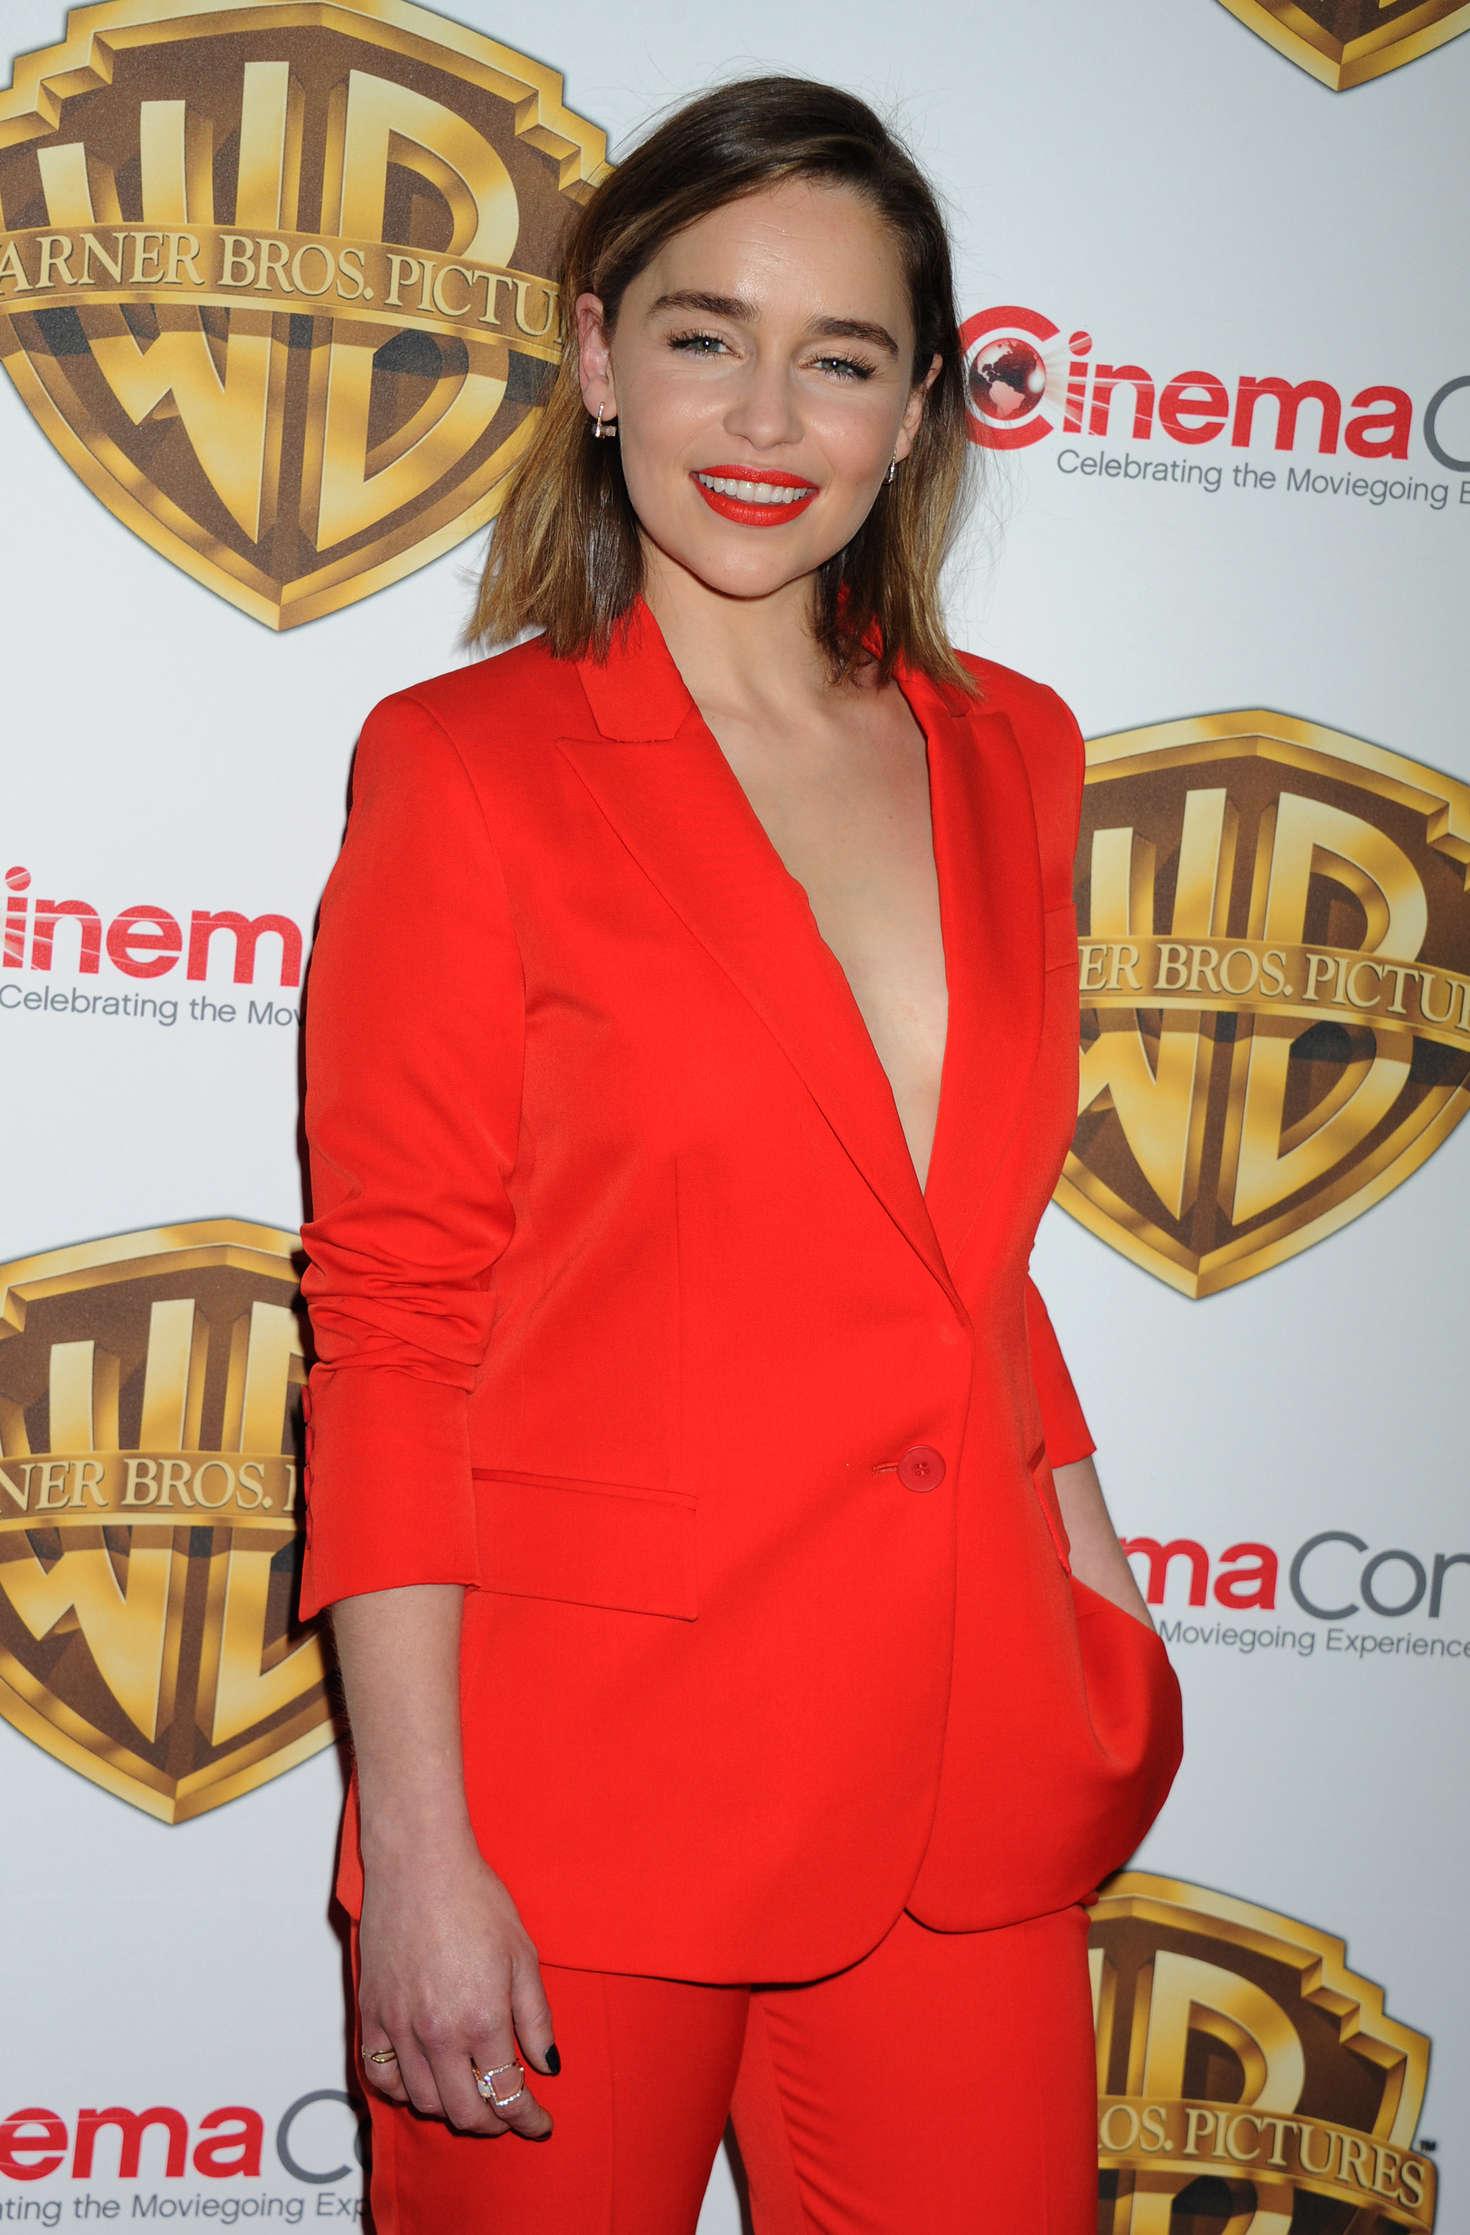 Emilia Clarke - 'The Big Picture' Presentation at CinemaCon 2016 in Las Vegas